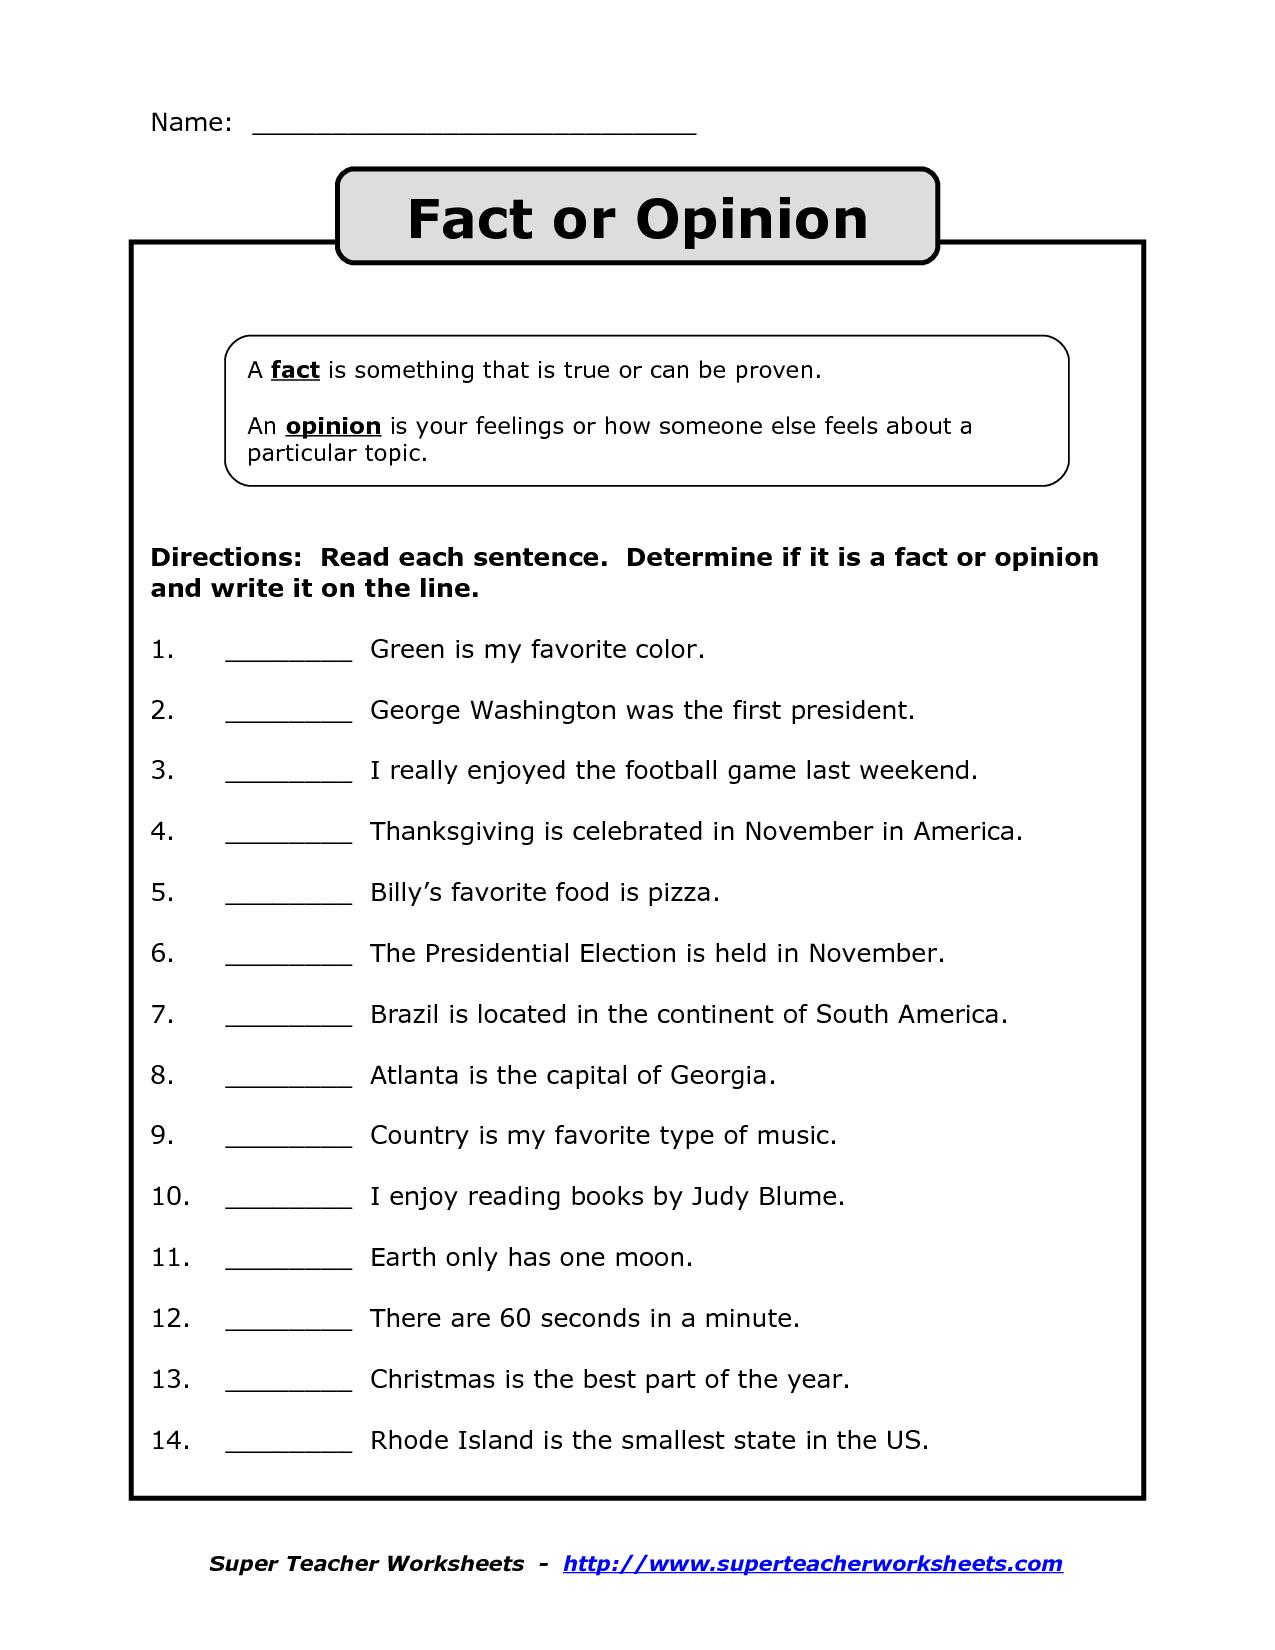 medium resolution of fact vs opinion worksheet - Google Search   Fact and opinion worksheet